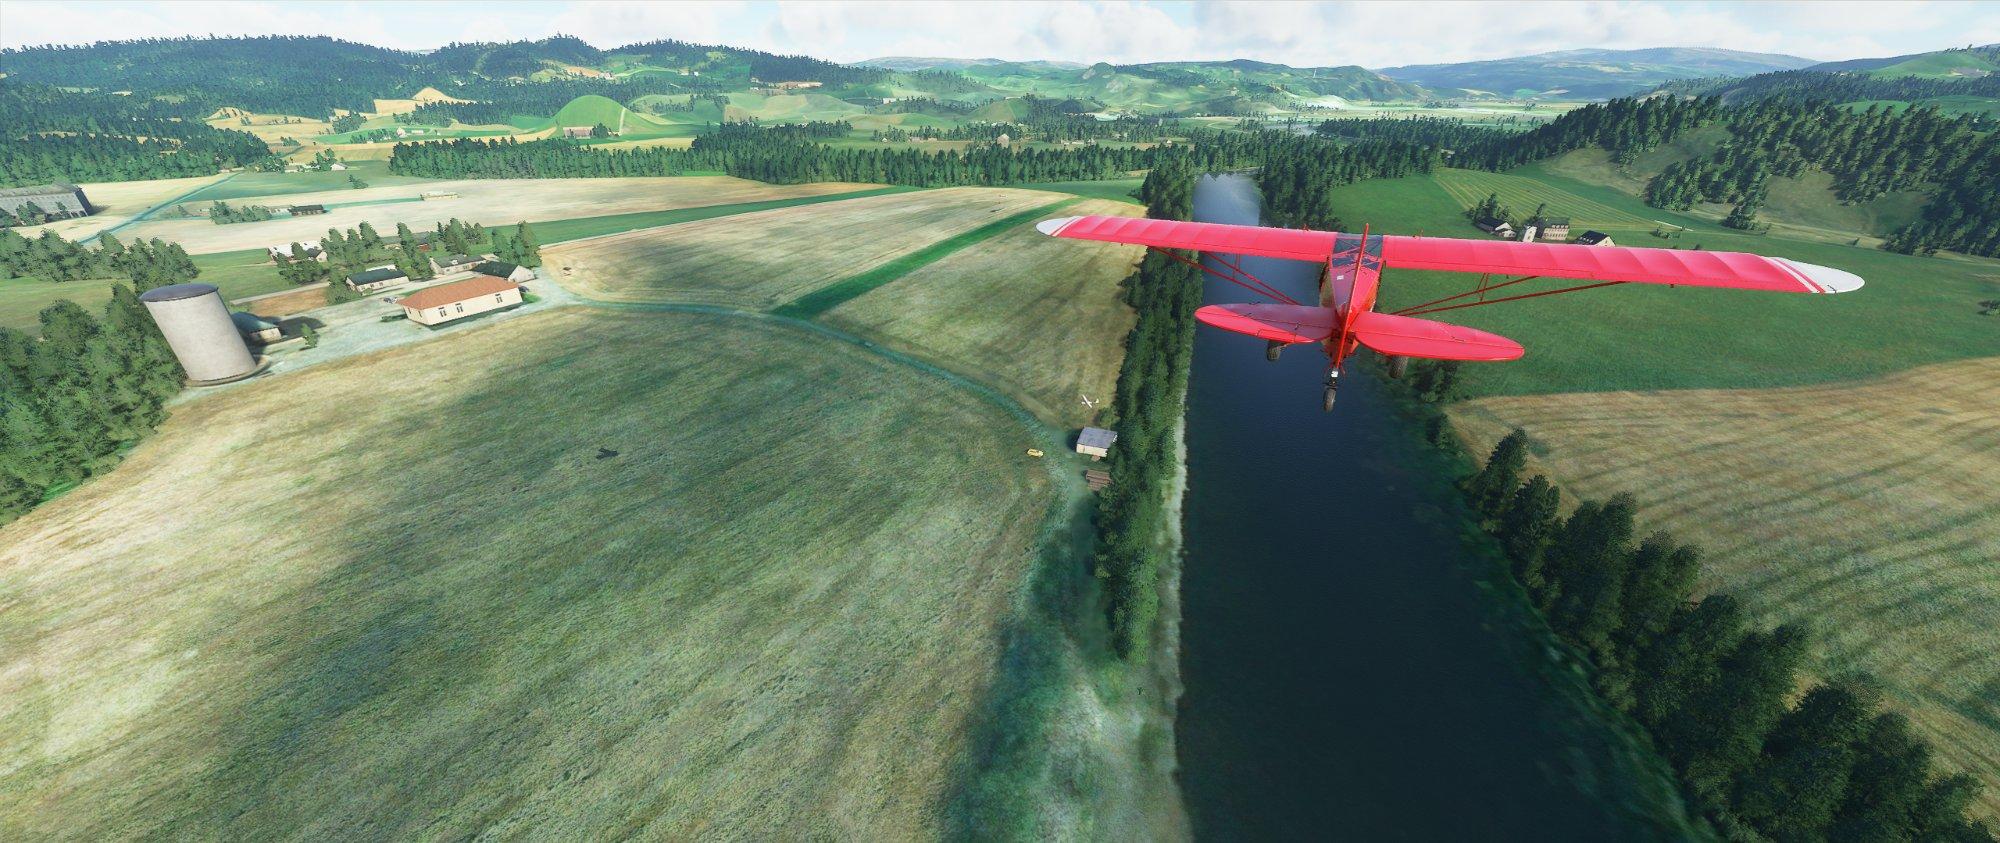 Microsoft Flight Simulator Screenshot 2020.09.24 - 13.52.28.71.jpg